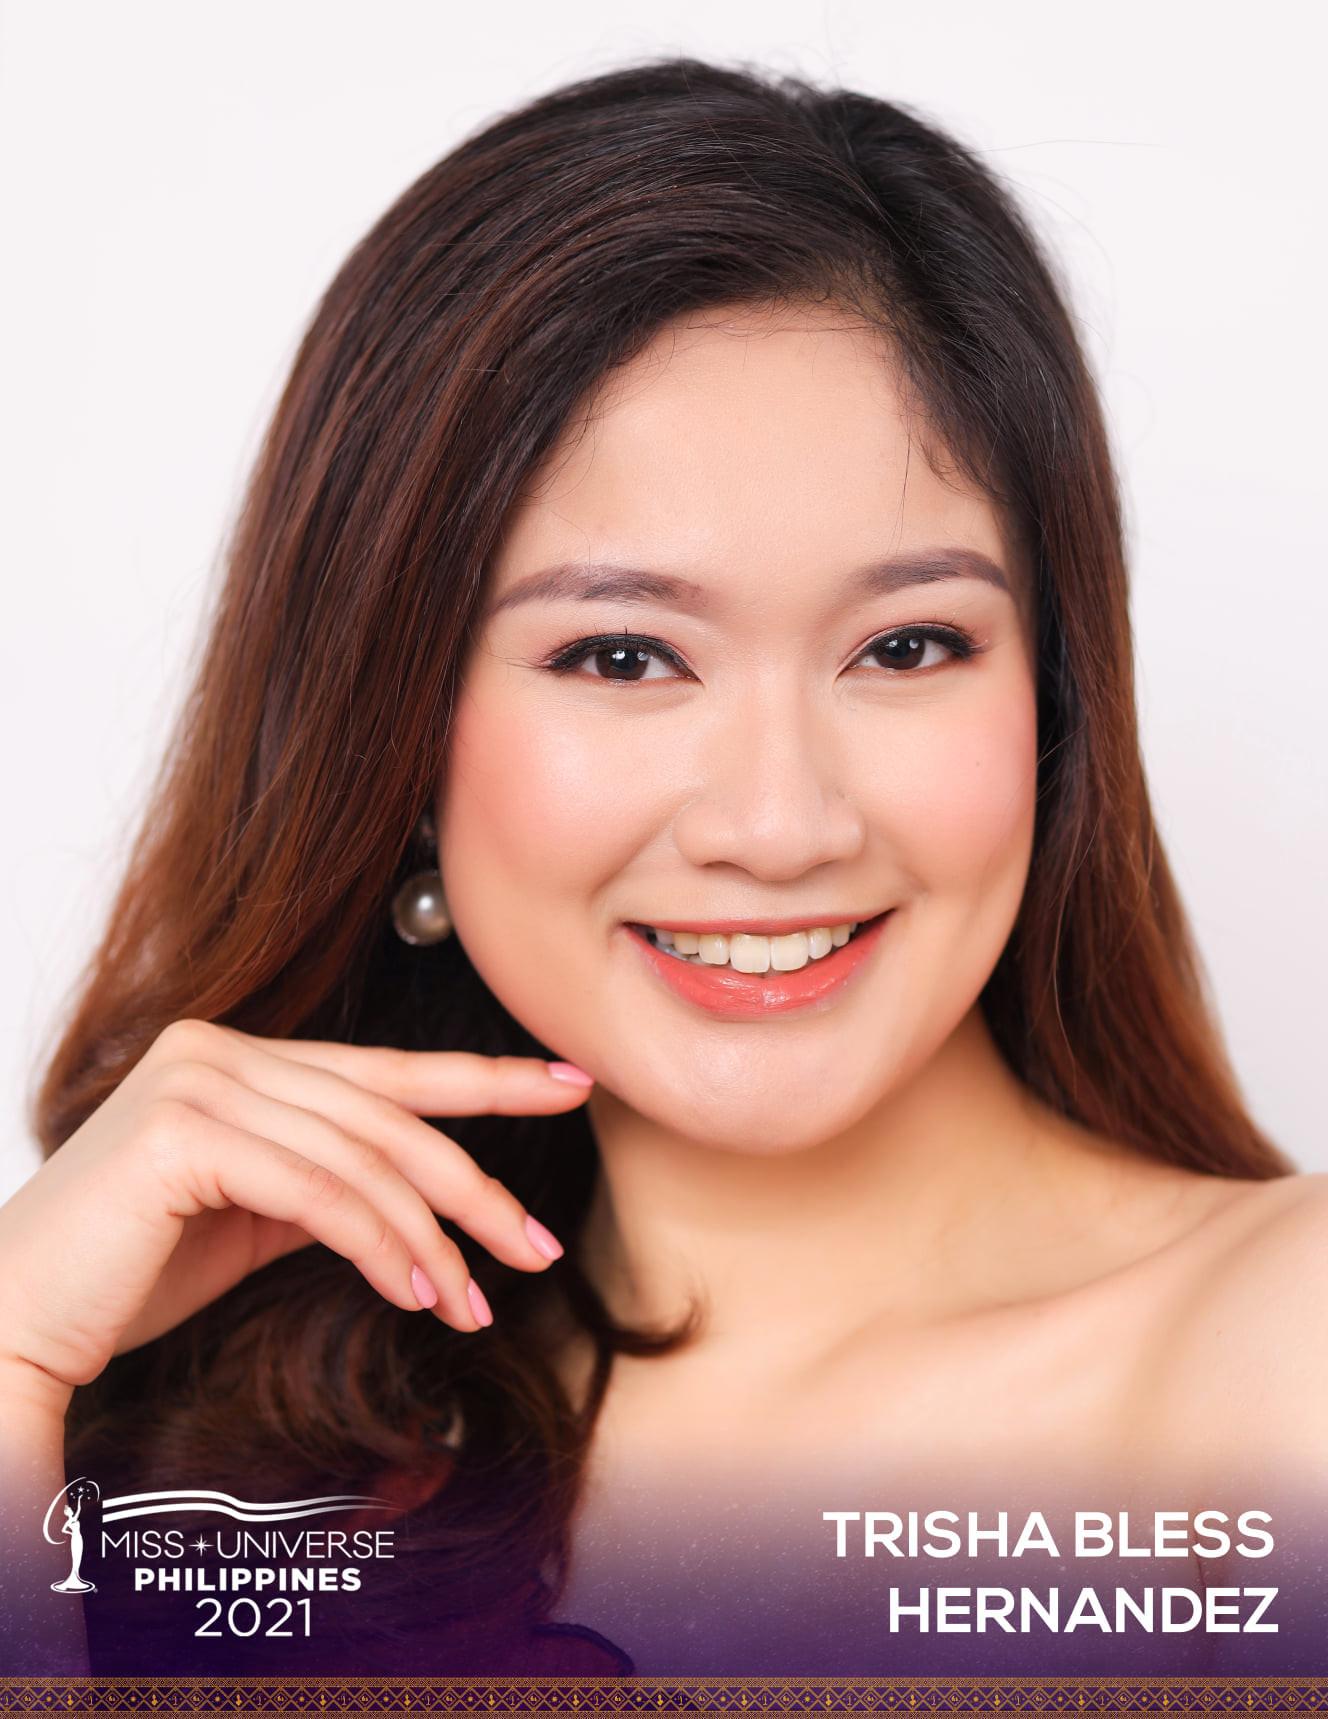 pre-candidatas a miss universe philippines 2021. - Página 4 Al53wQ